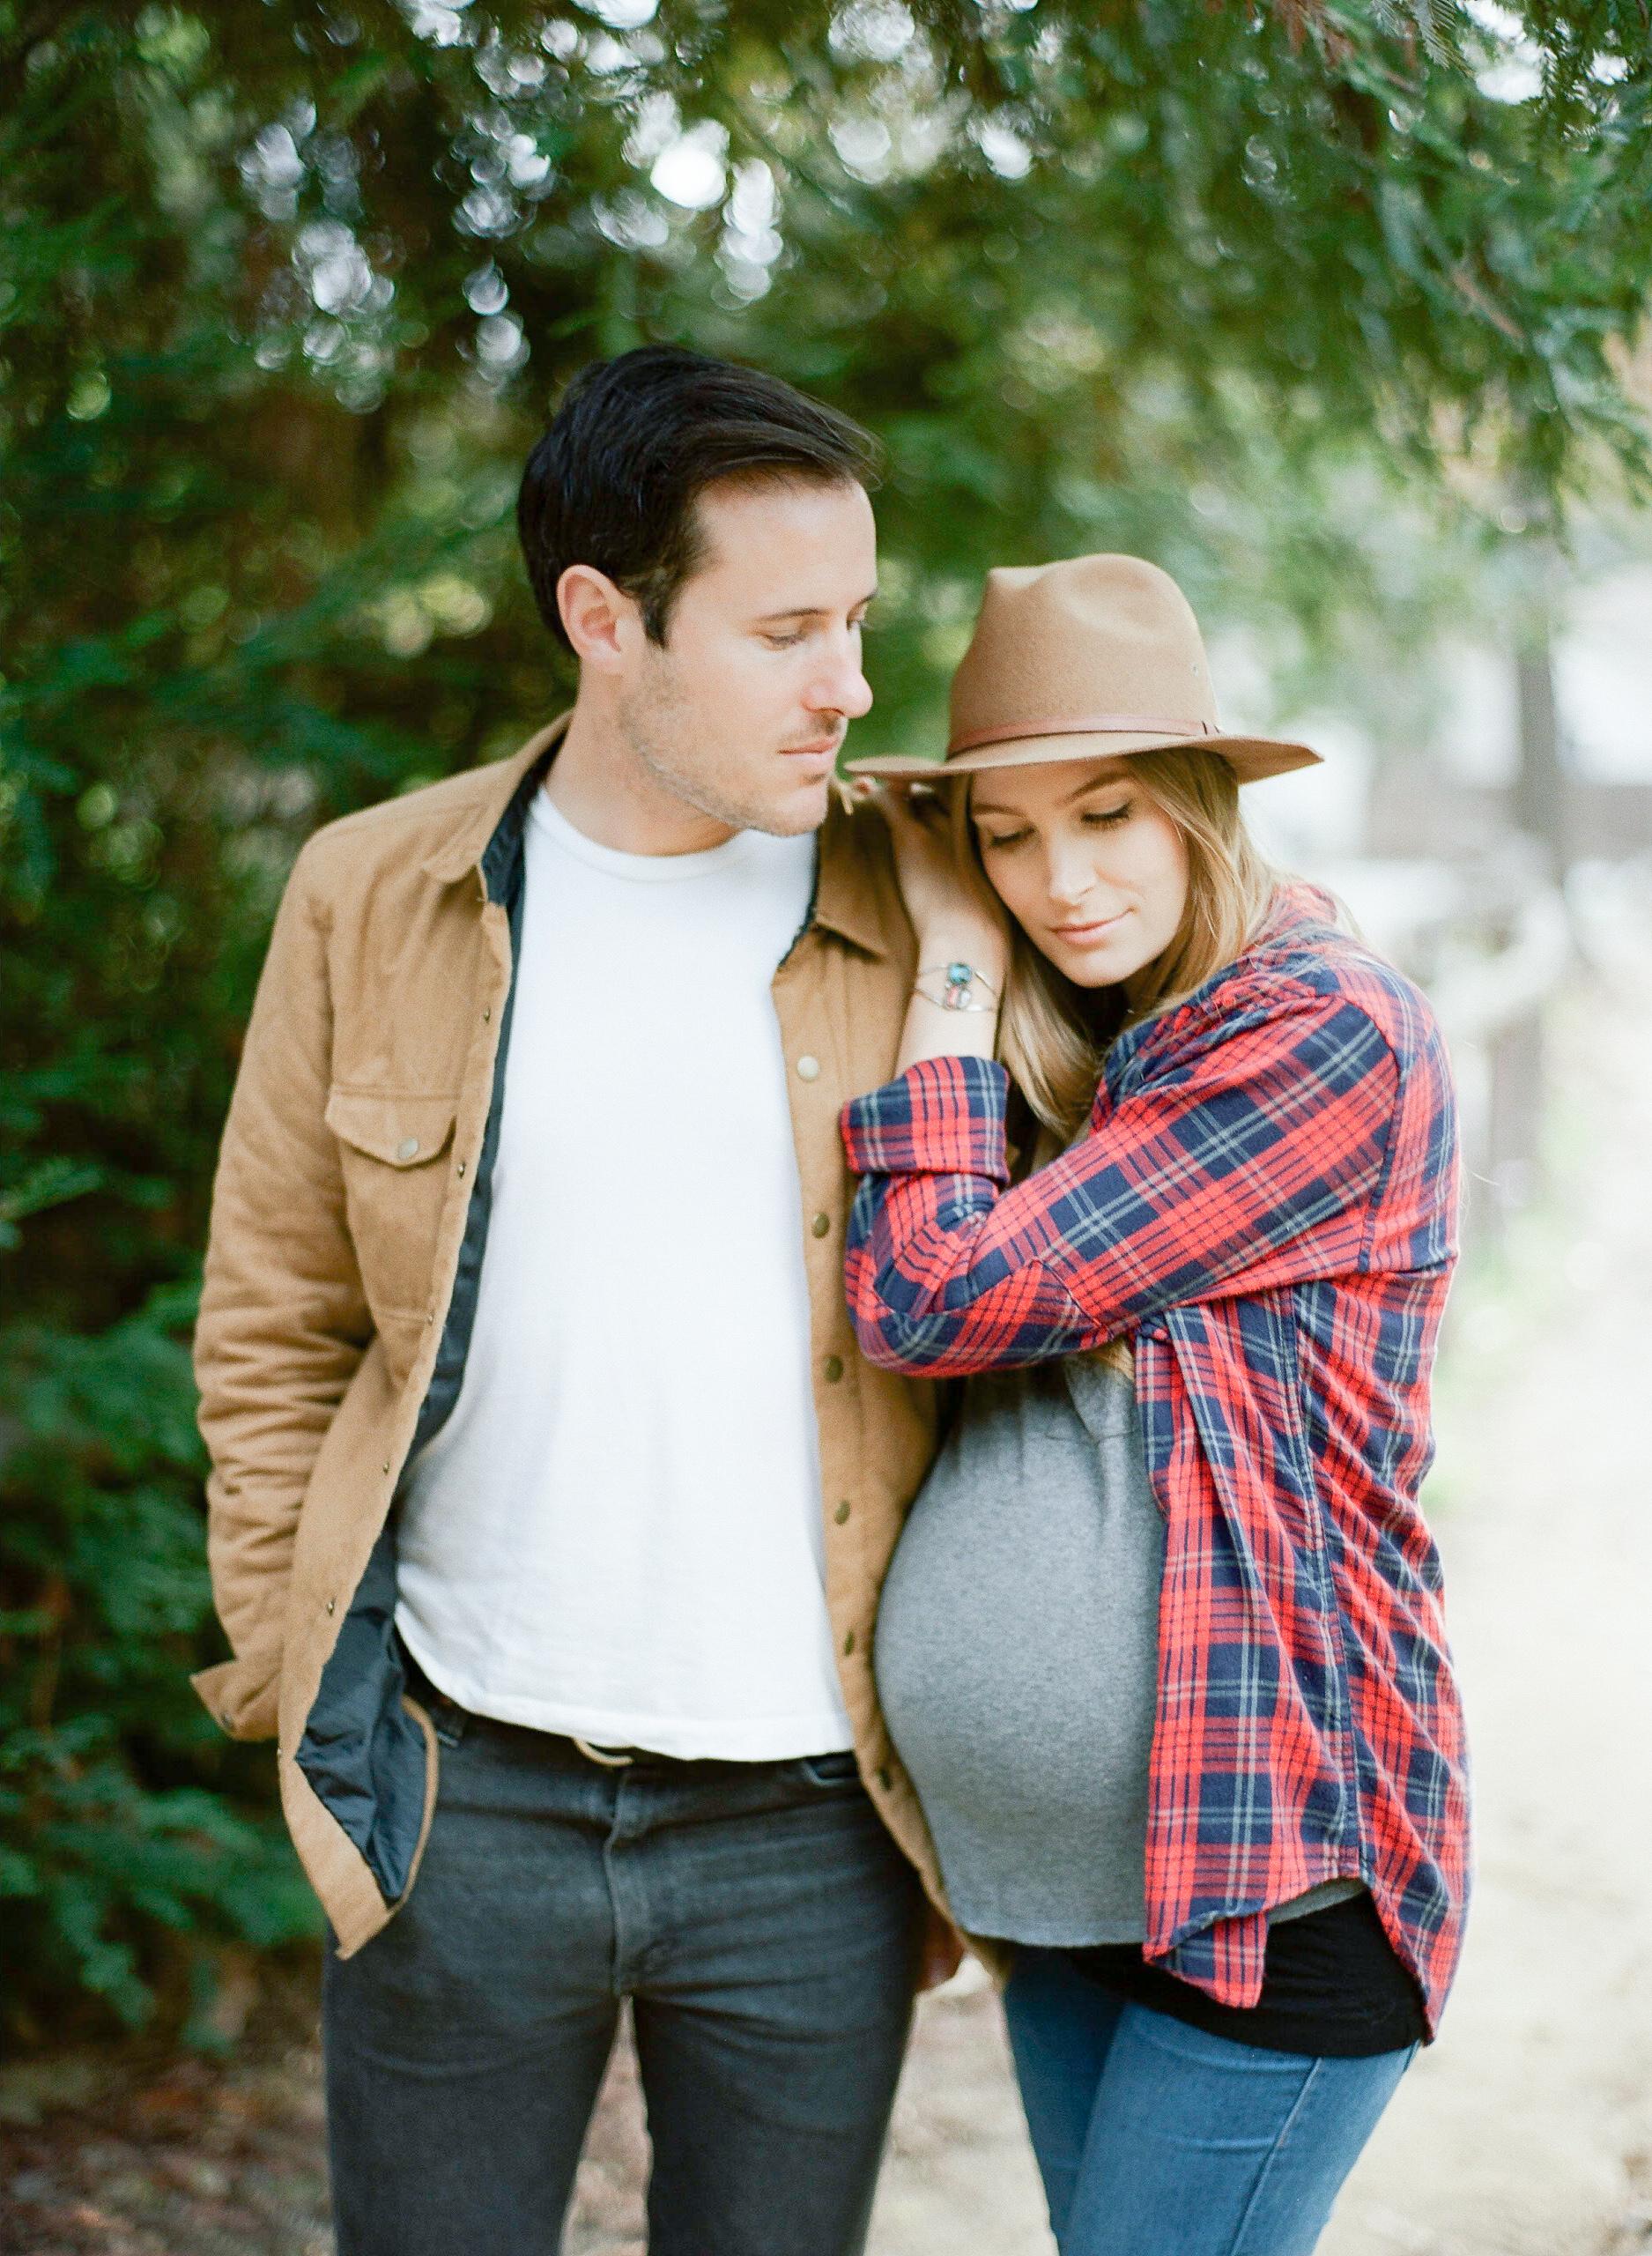 Chrissy & David Maternity Session-15.jpg